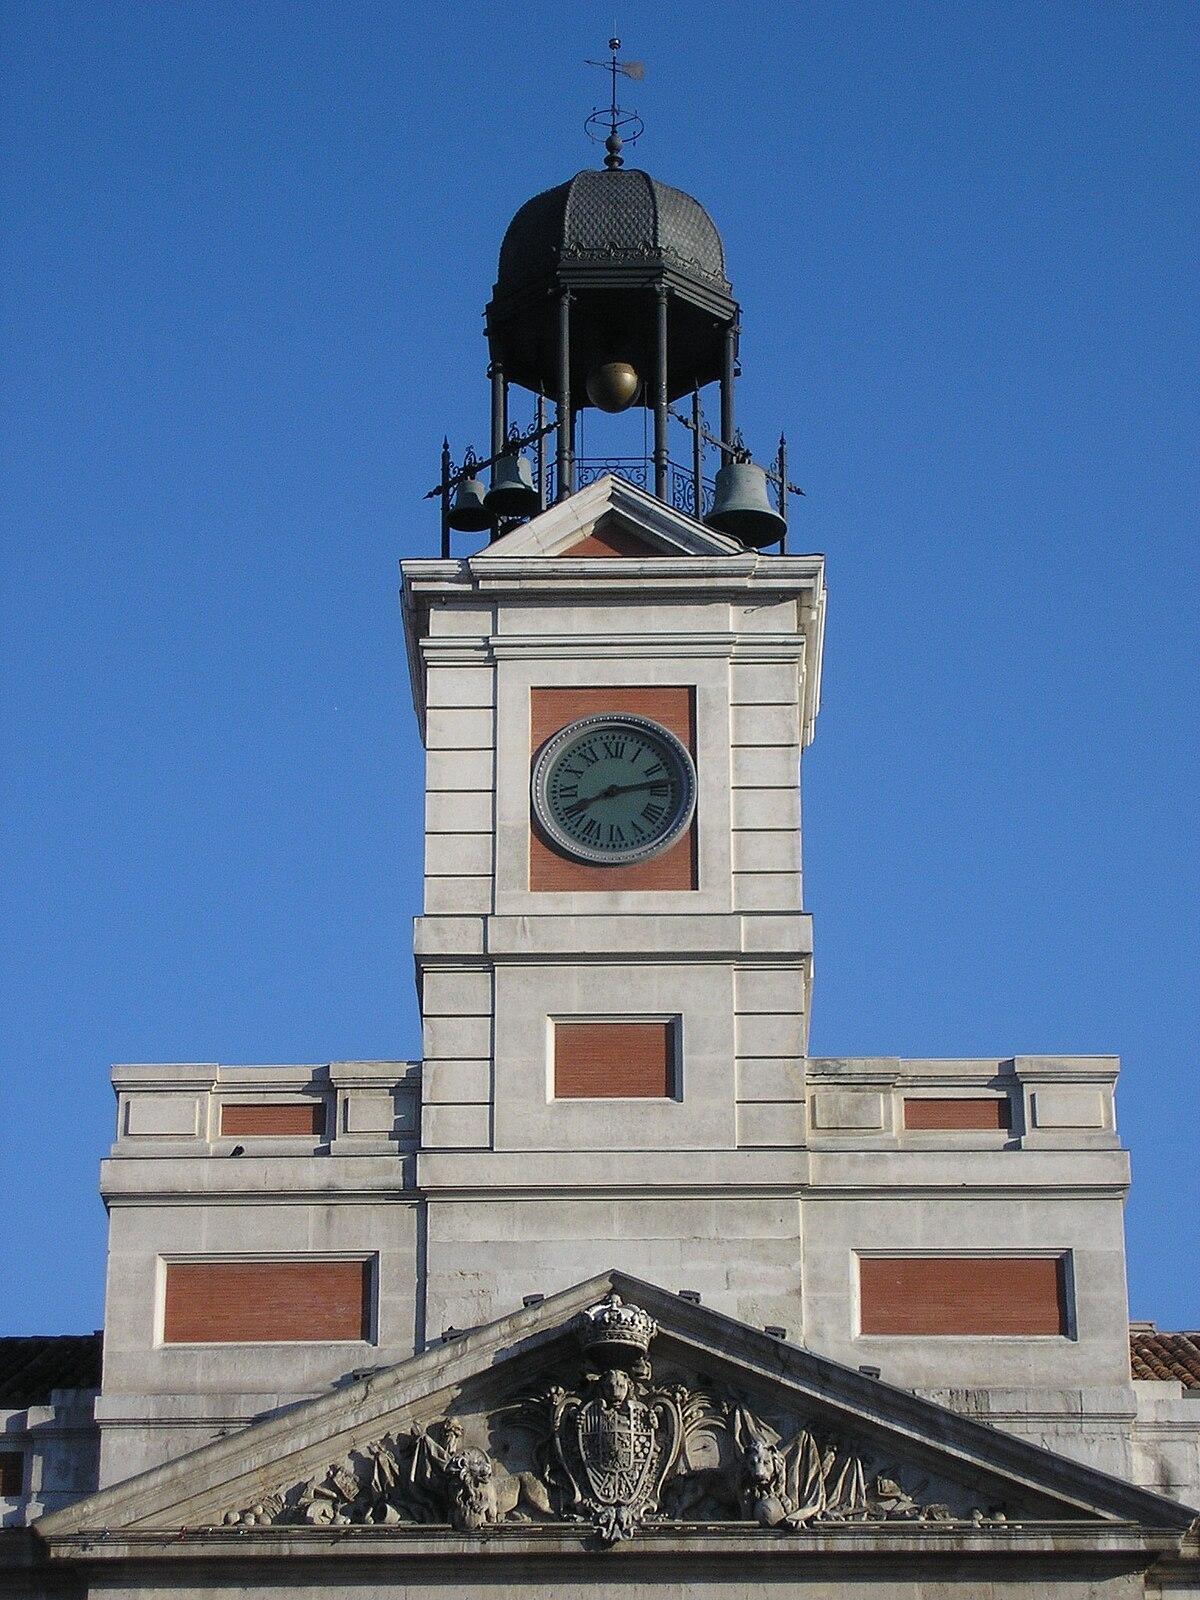 Reloj de torre wikipedia la enciclopedia libre for Edificio puerta del sol quito